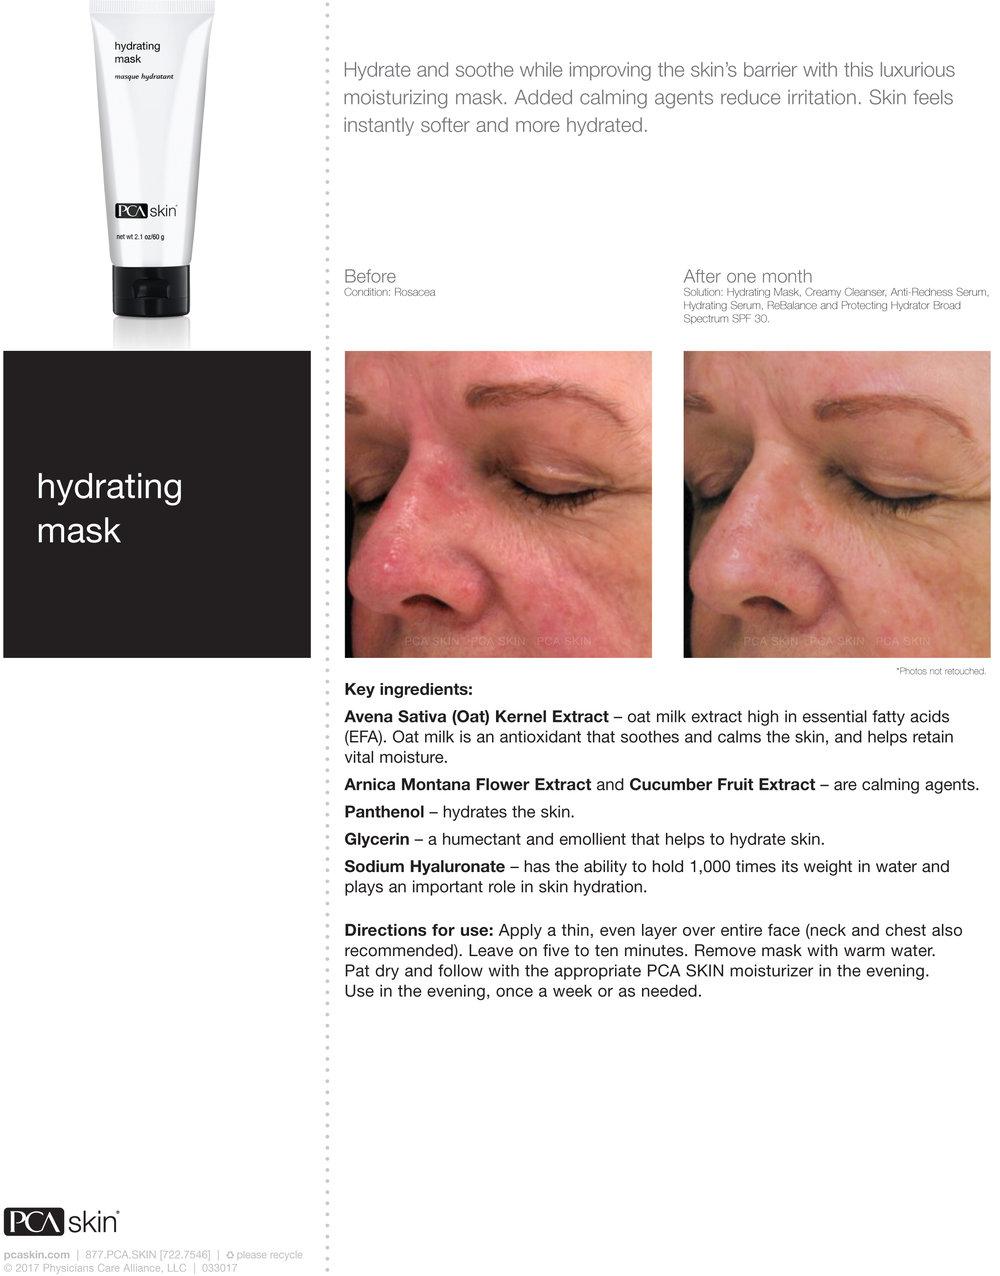 HydratingMask_FactSheet.jpg